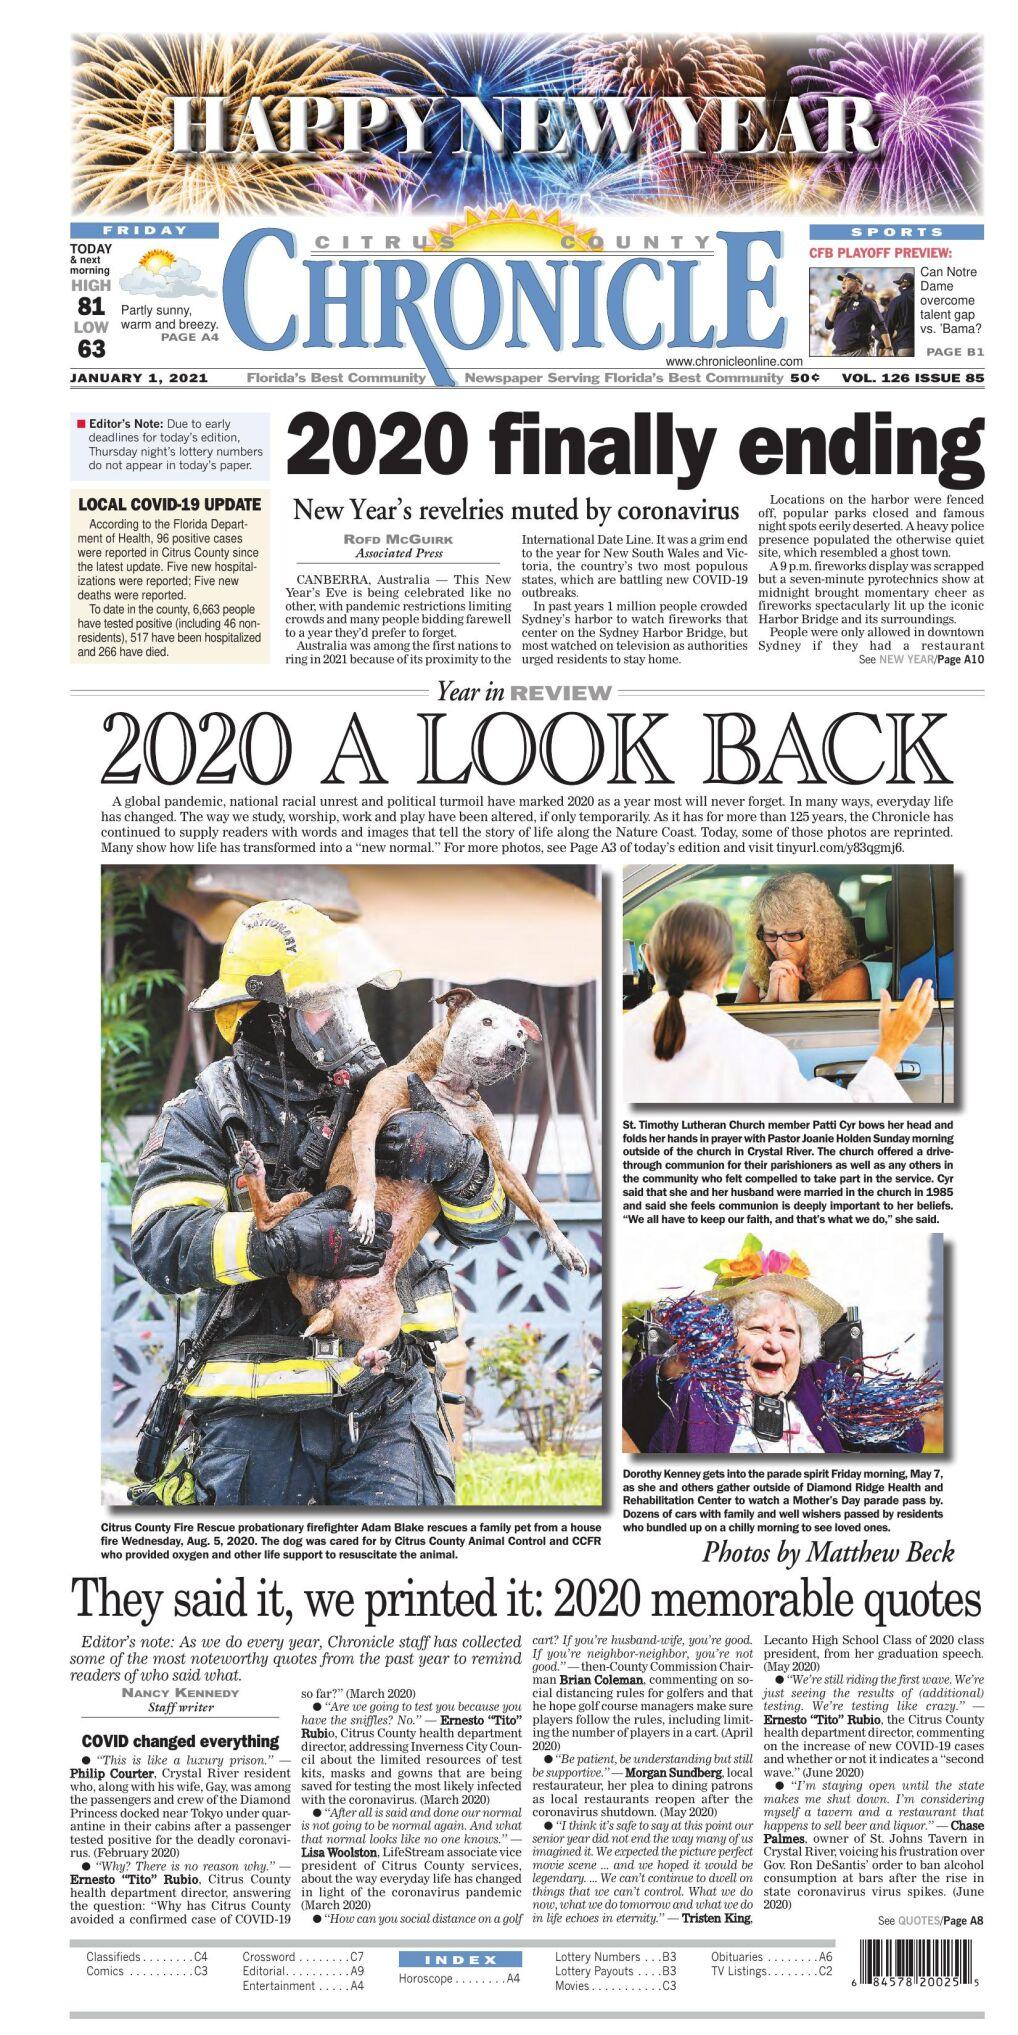 Citrus County Chronicle e-edition Jan 1, 2021